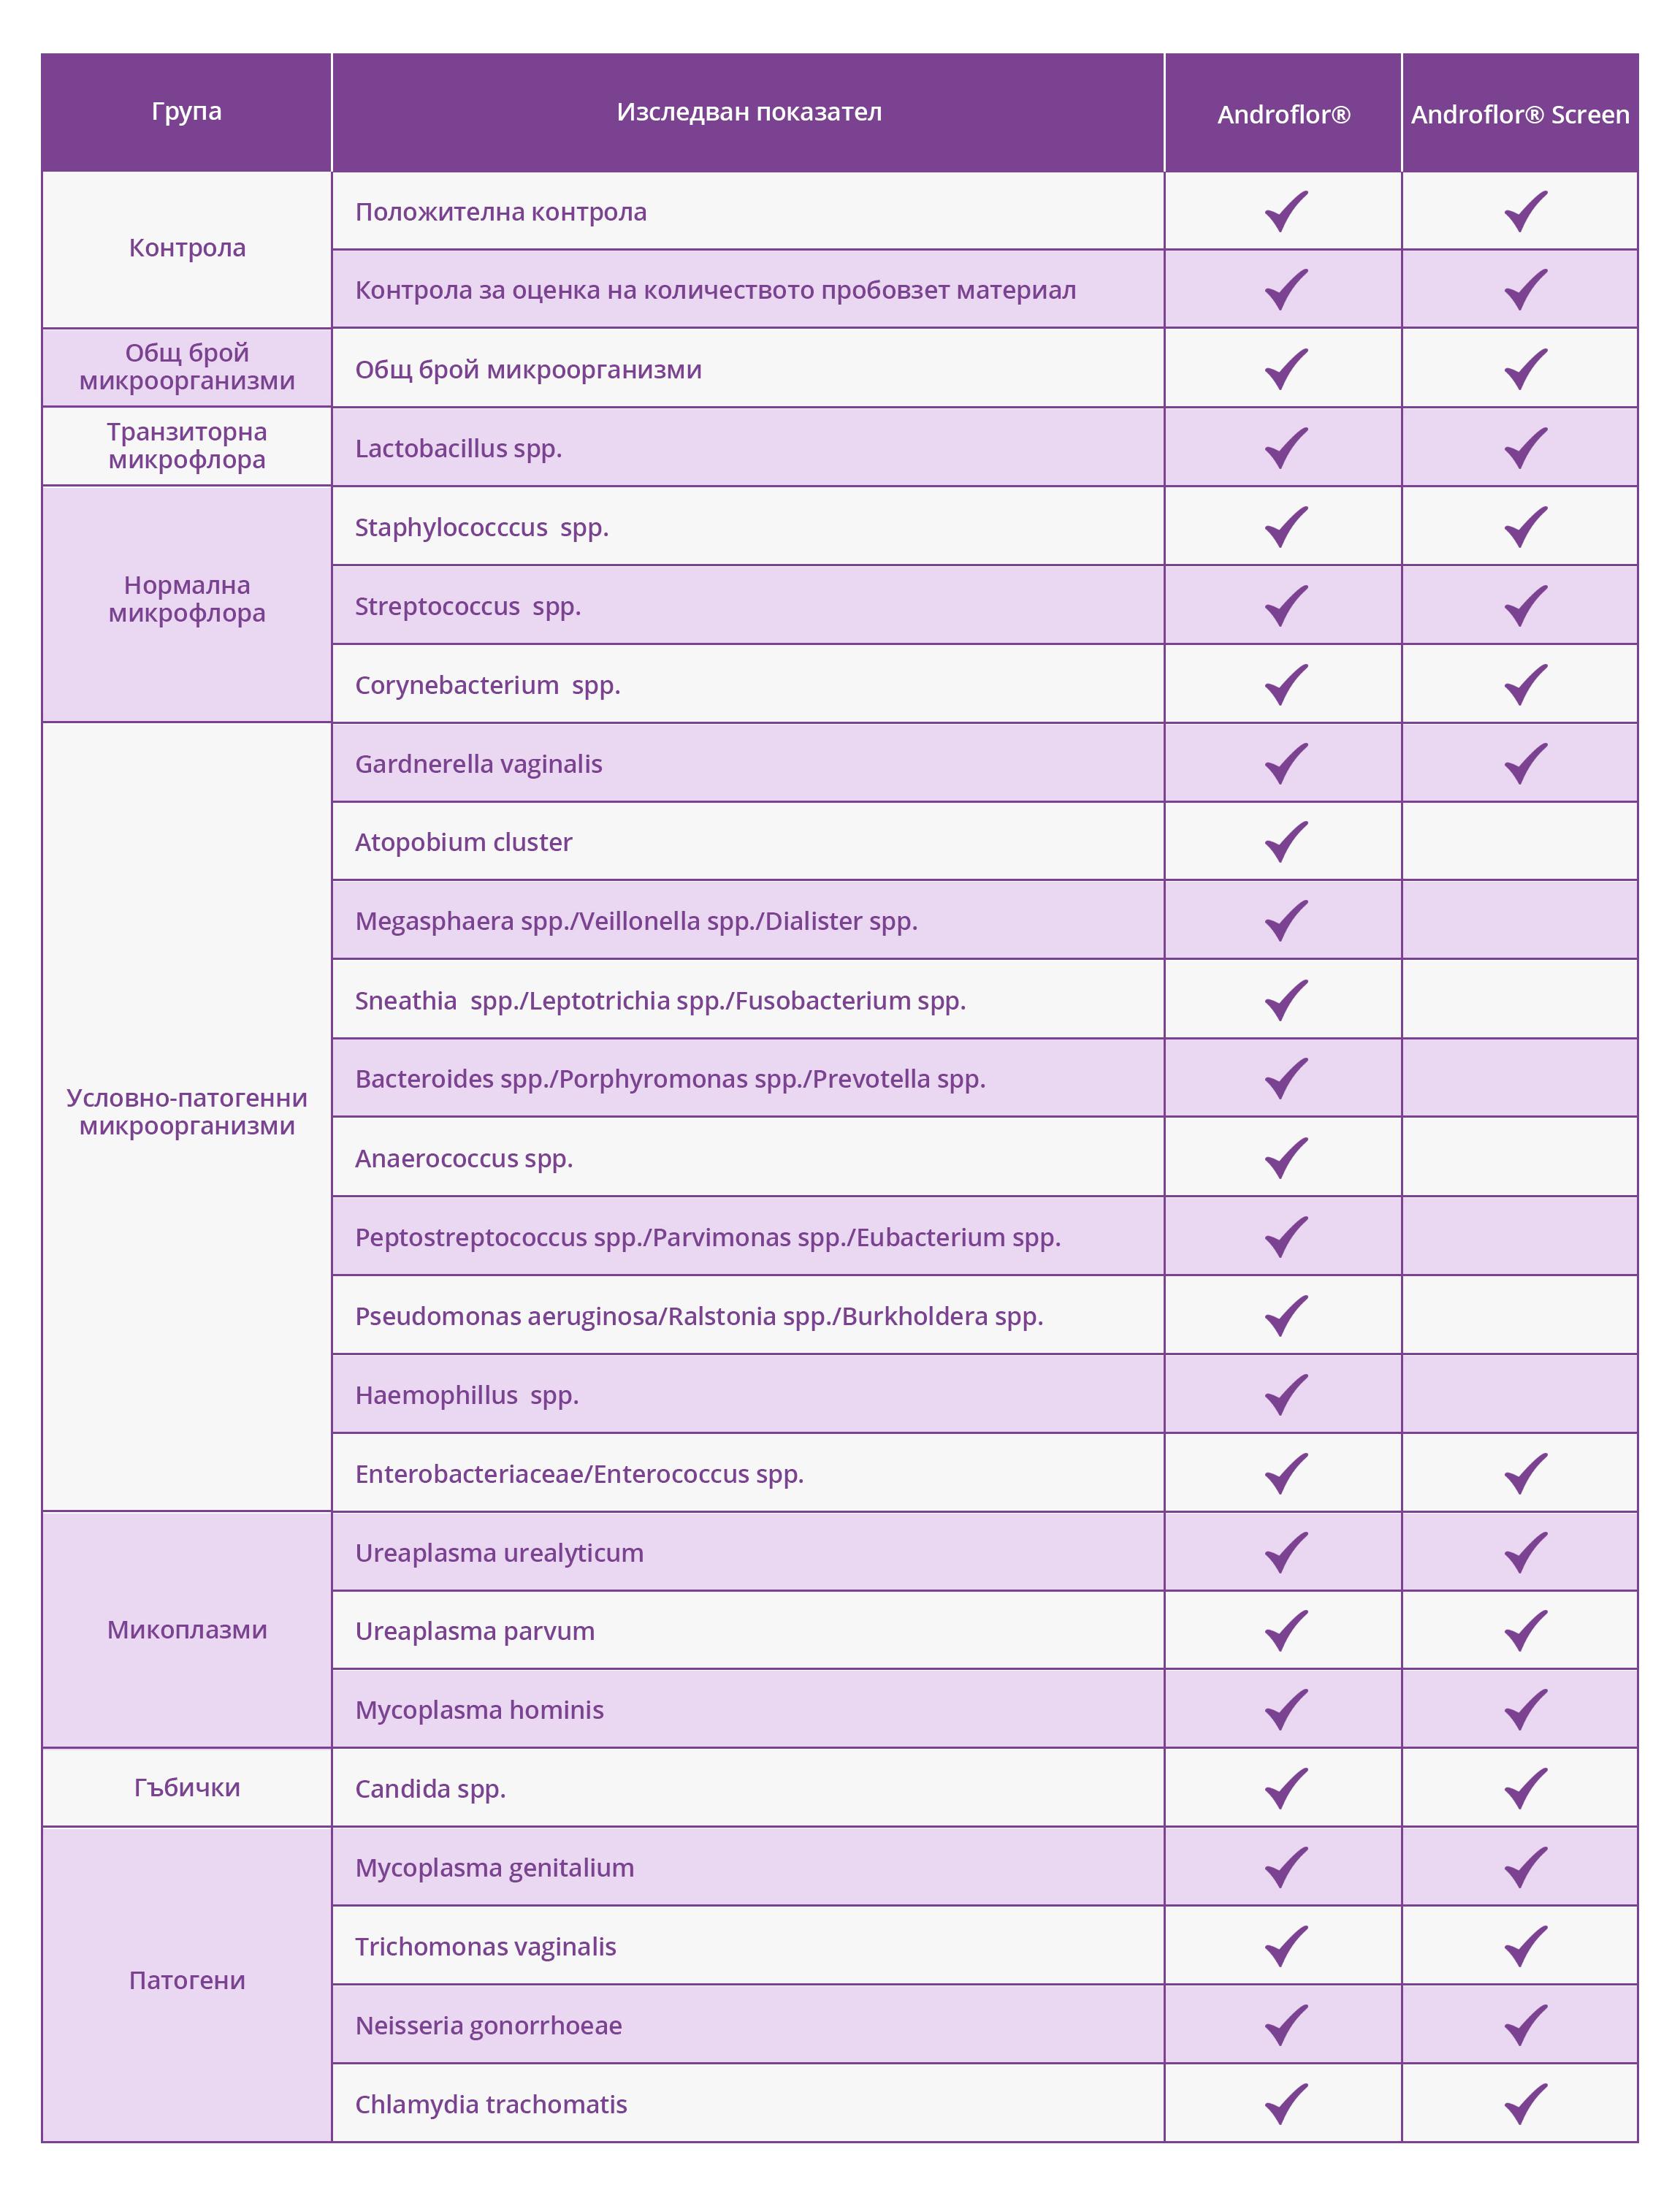 table androflor diagnostic panels